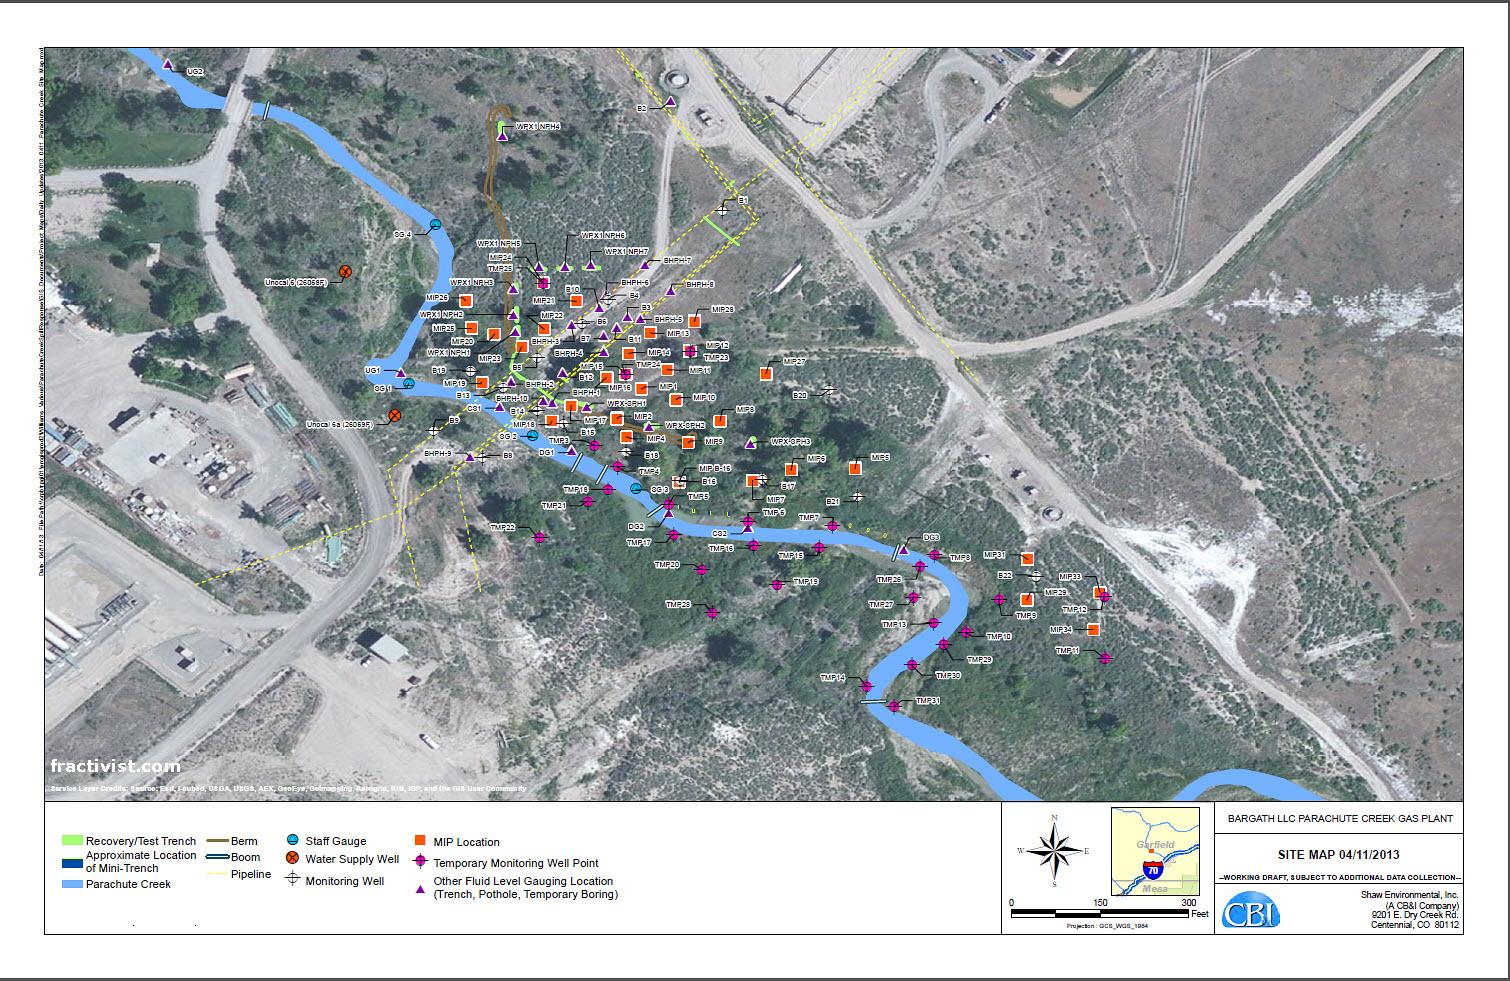 FRACTIVIST  Assist Reform and Protect Parachute Creek Colorado